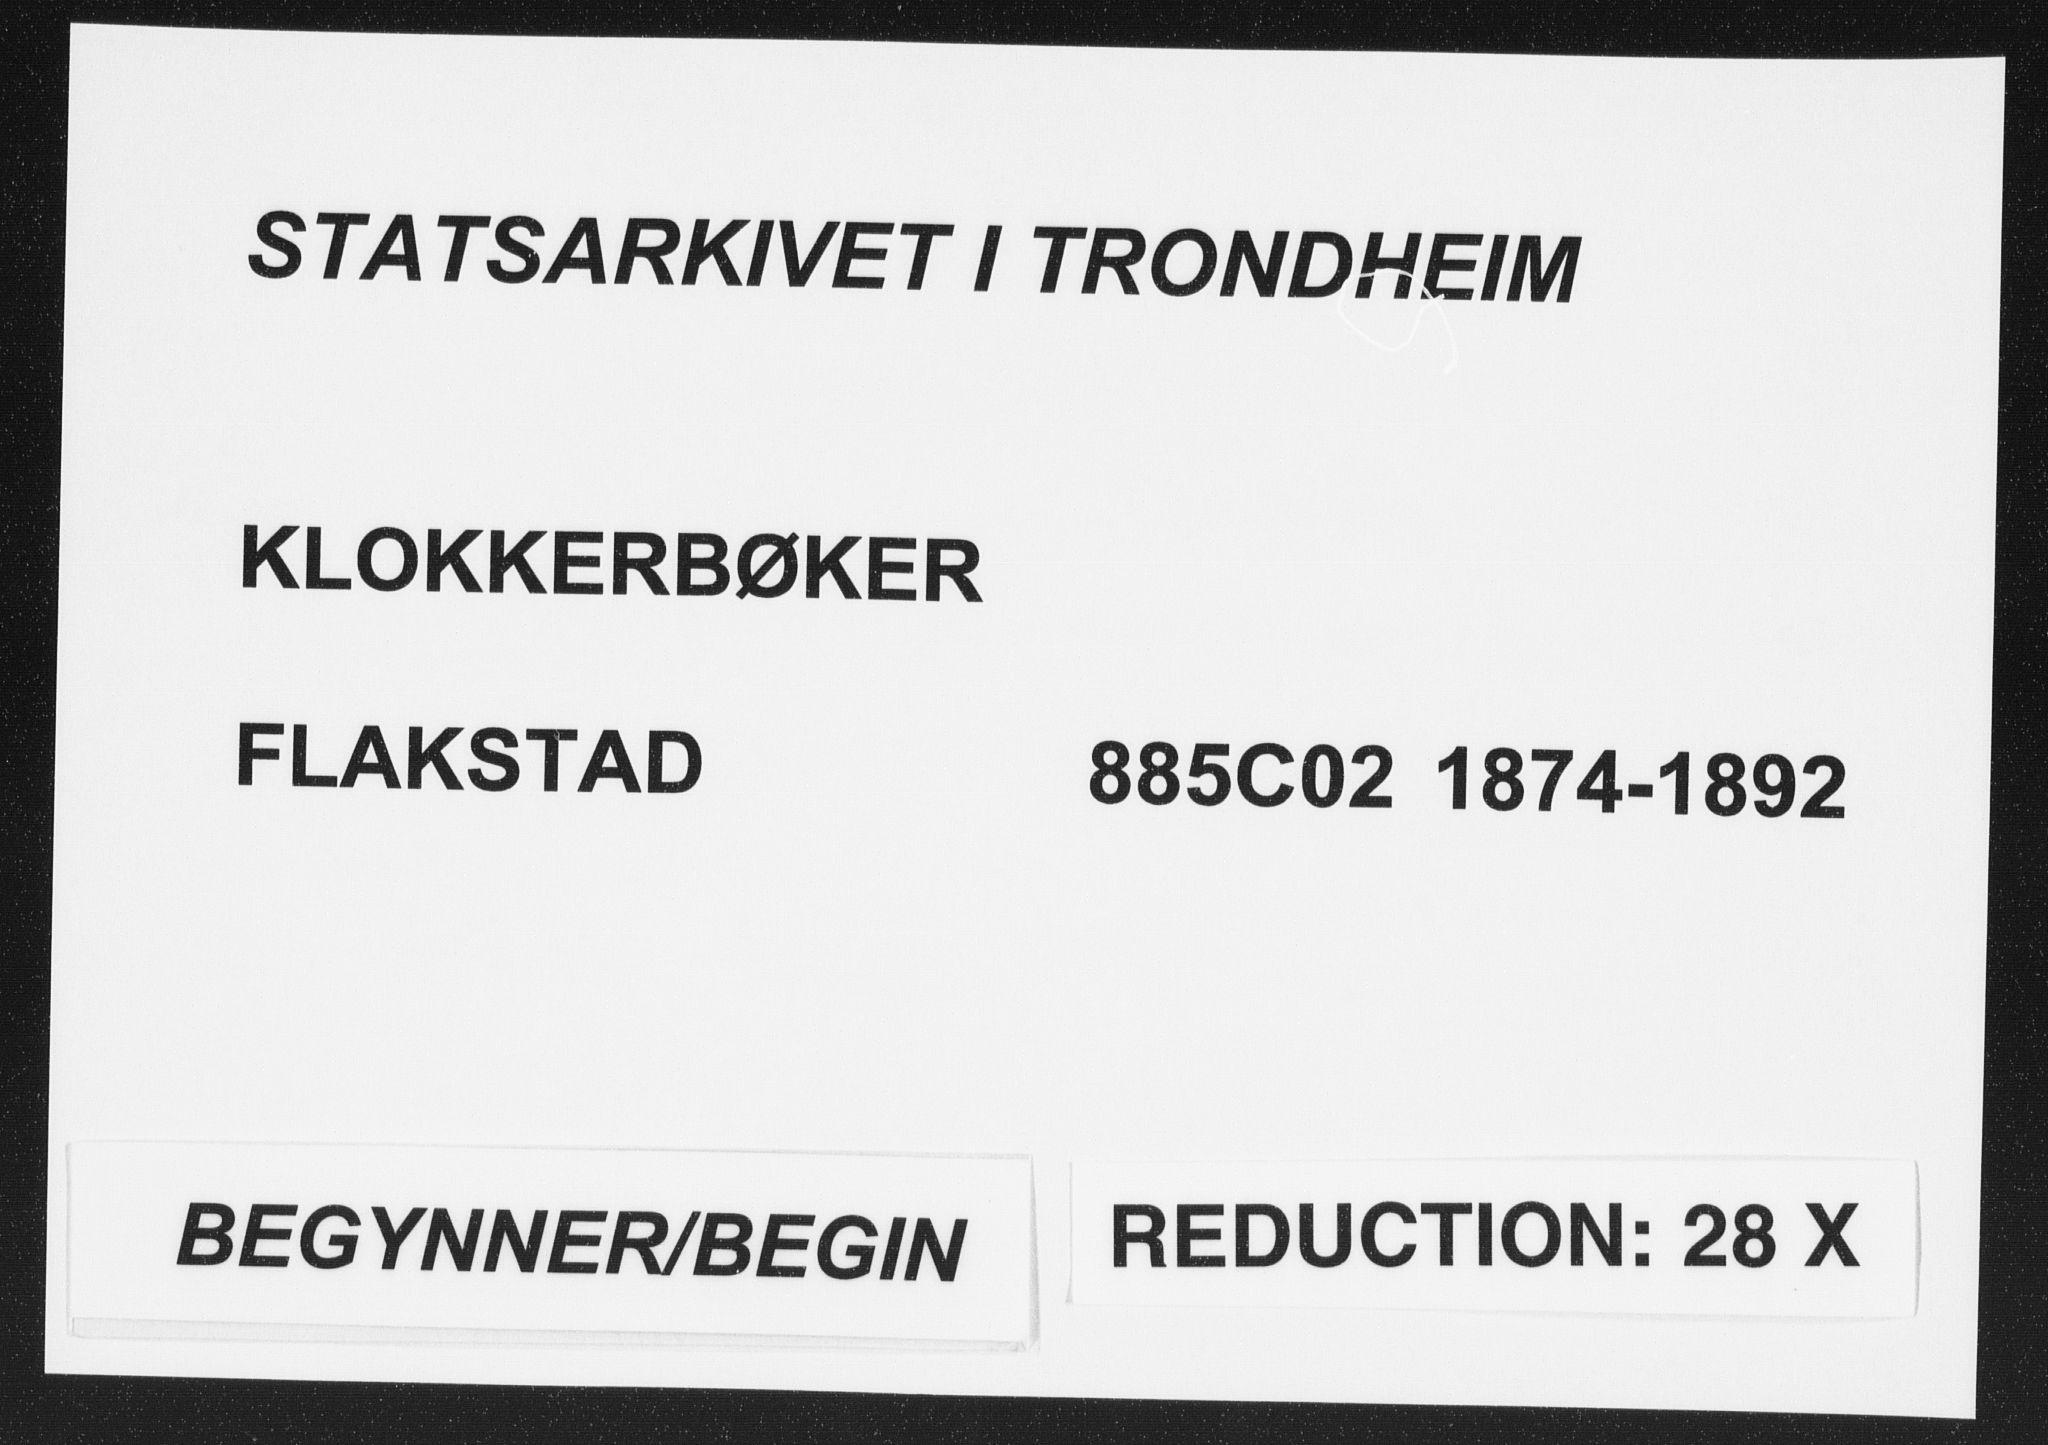 SAT, Ministerialprotokoller, klokkerbøker og fødselsregistre - Nordland, 885/L1213: Klokkerbok nr. 885C02, 1874-1892